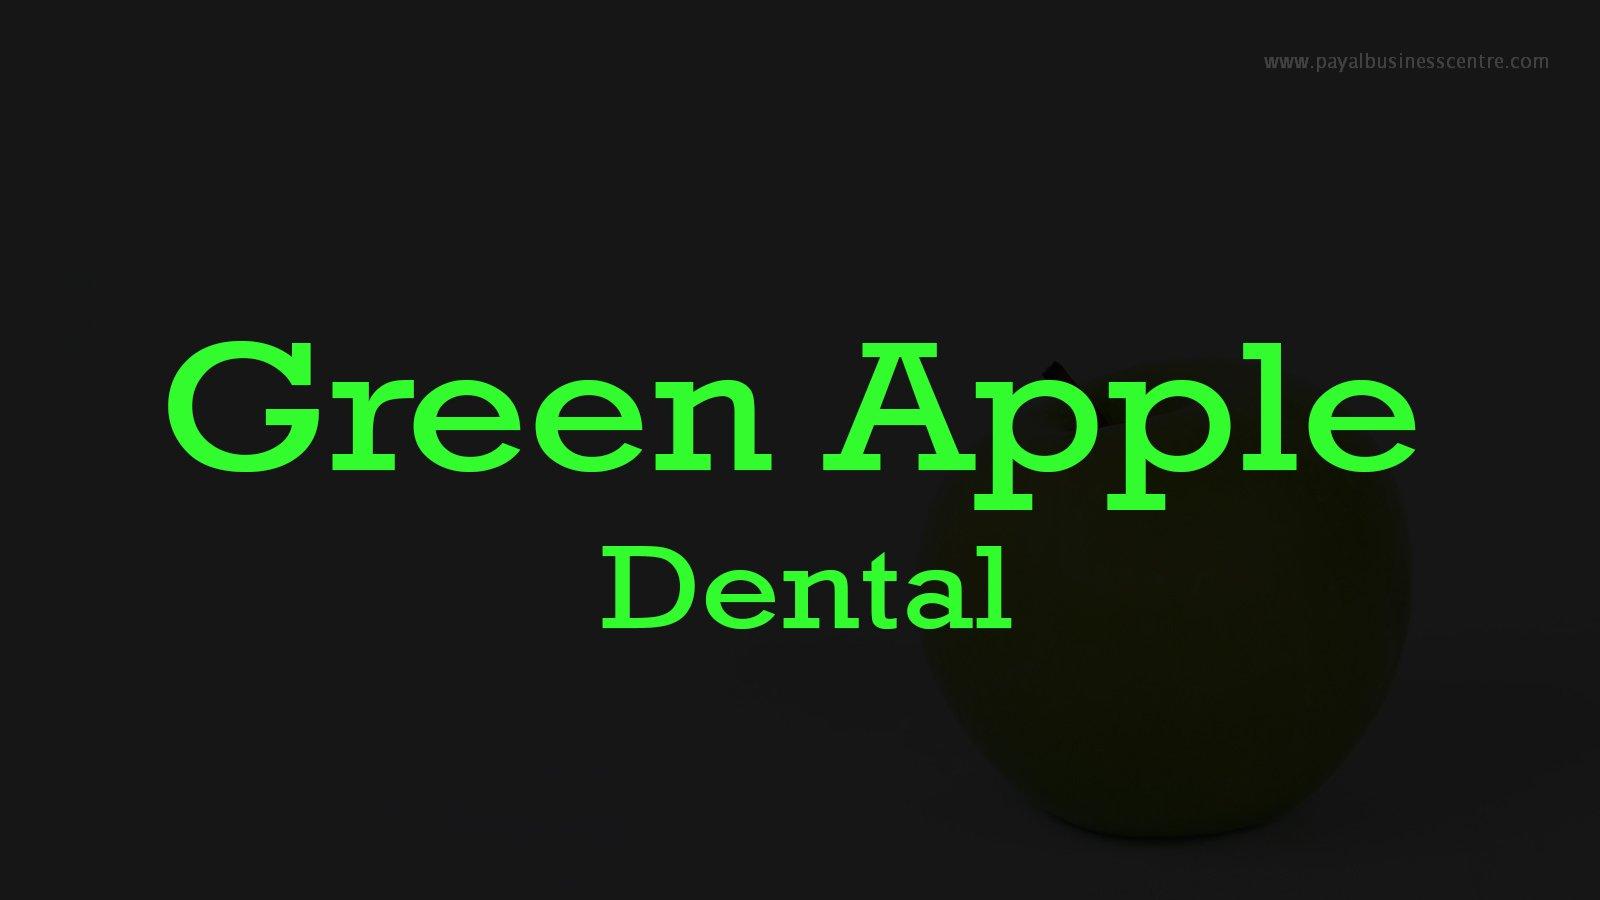 Green Apple Dental - Medical - 12885 80 Ave